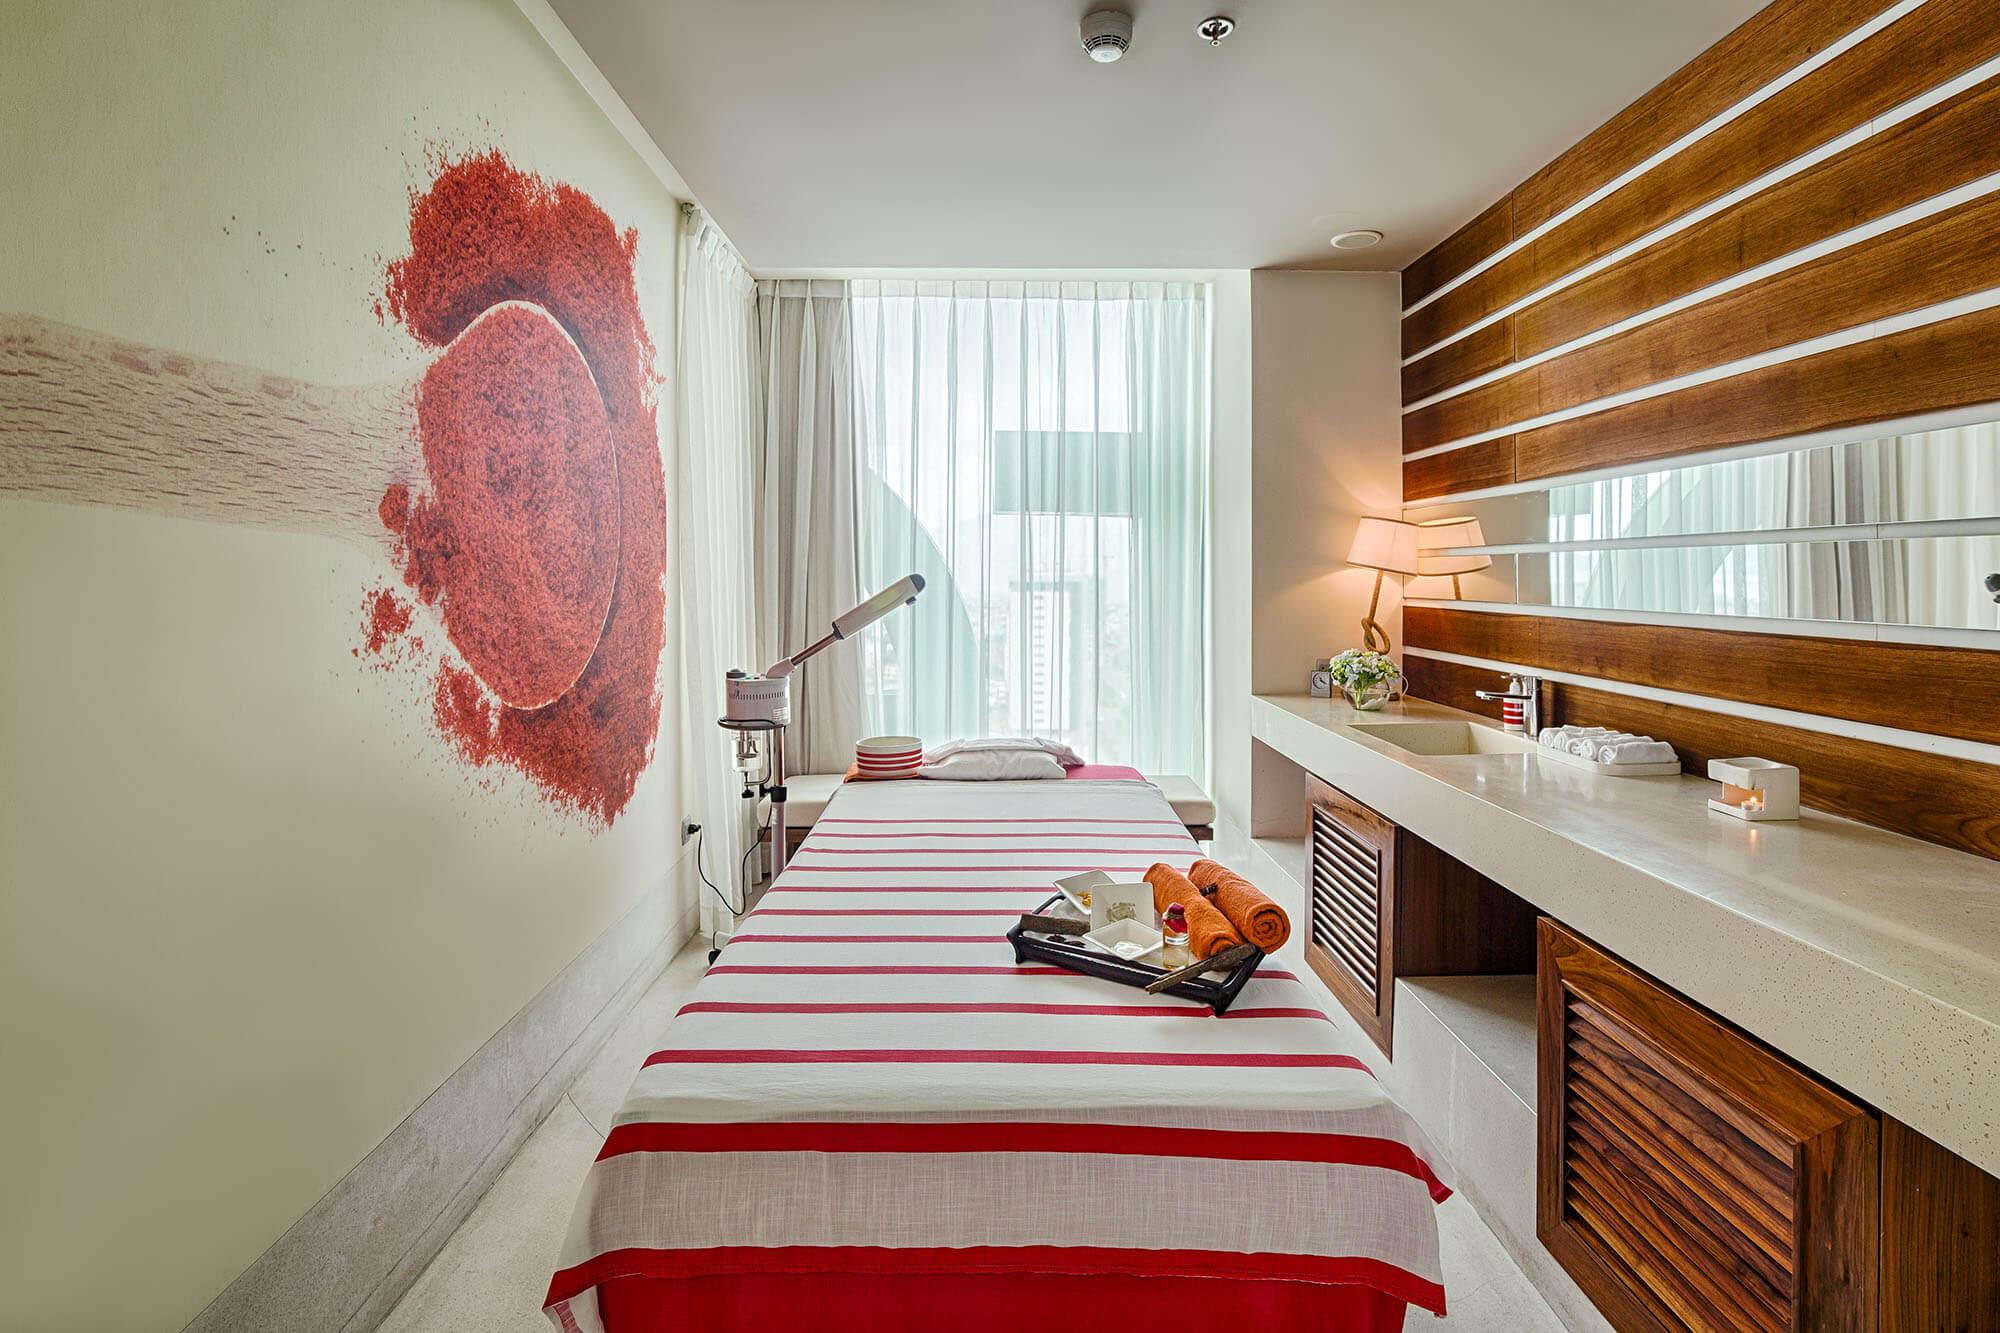 Spice Spa A La Carte Danang Beach Hotel 200 Vo Nguyen Giap Danang Fantasticity Com 03